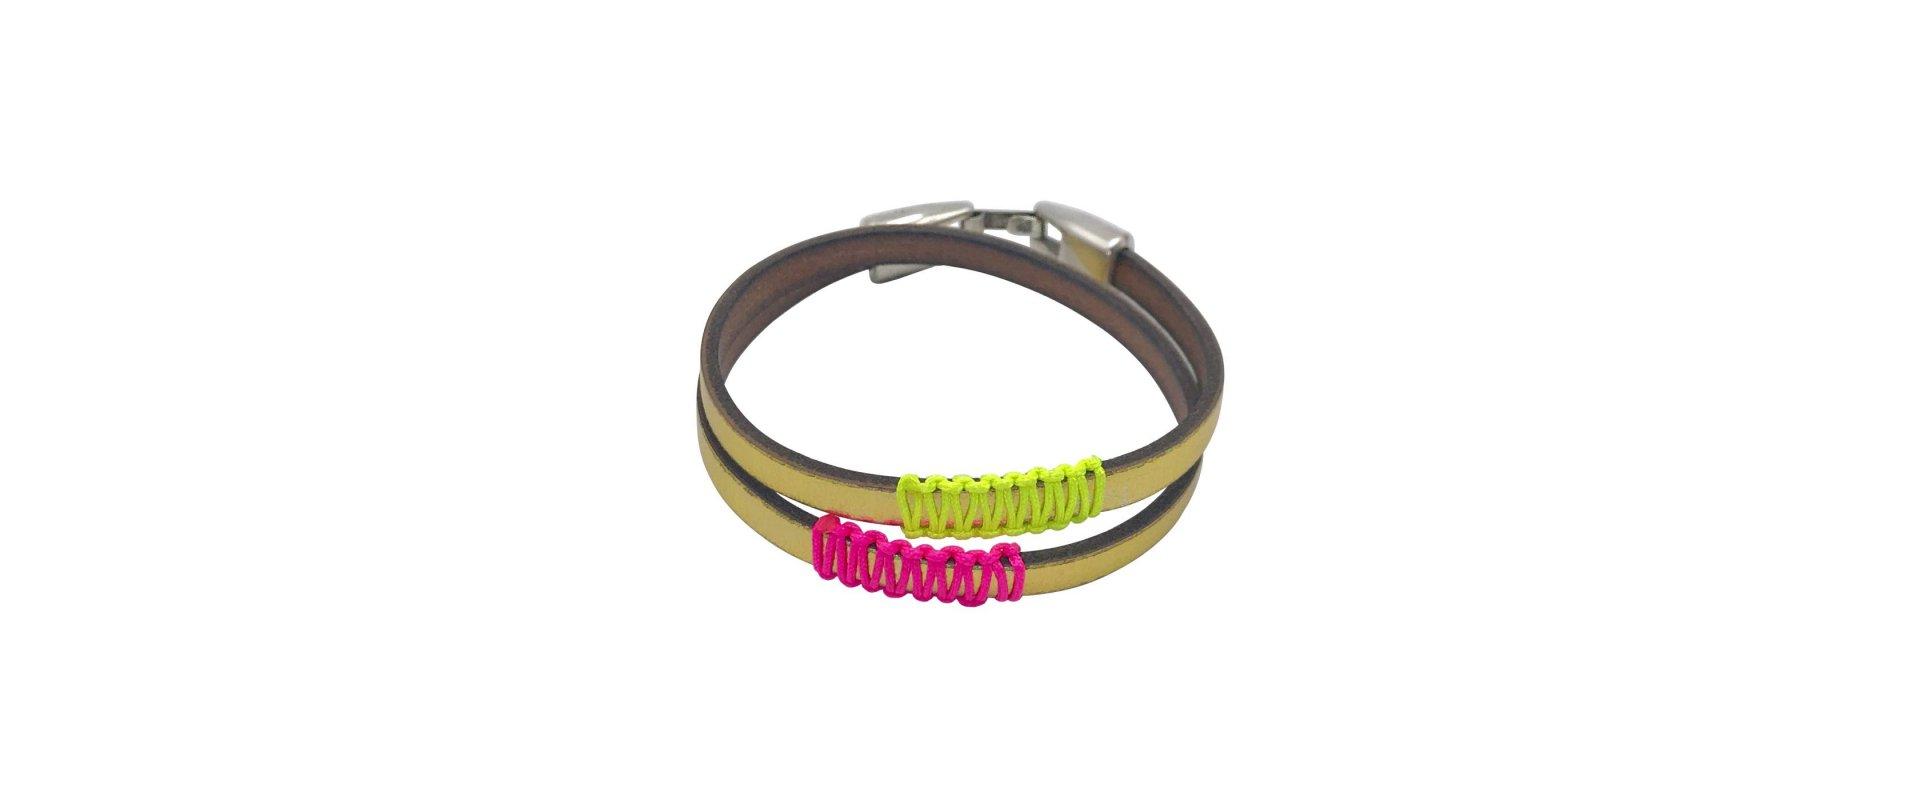 Bracelet Doríl in online store anabi.online